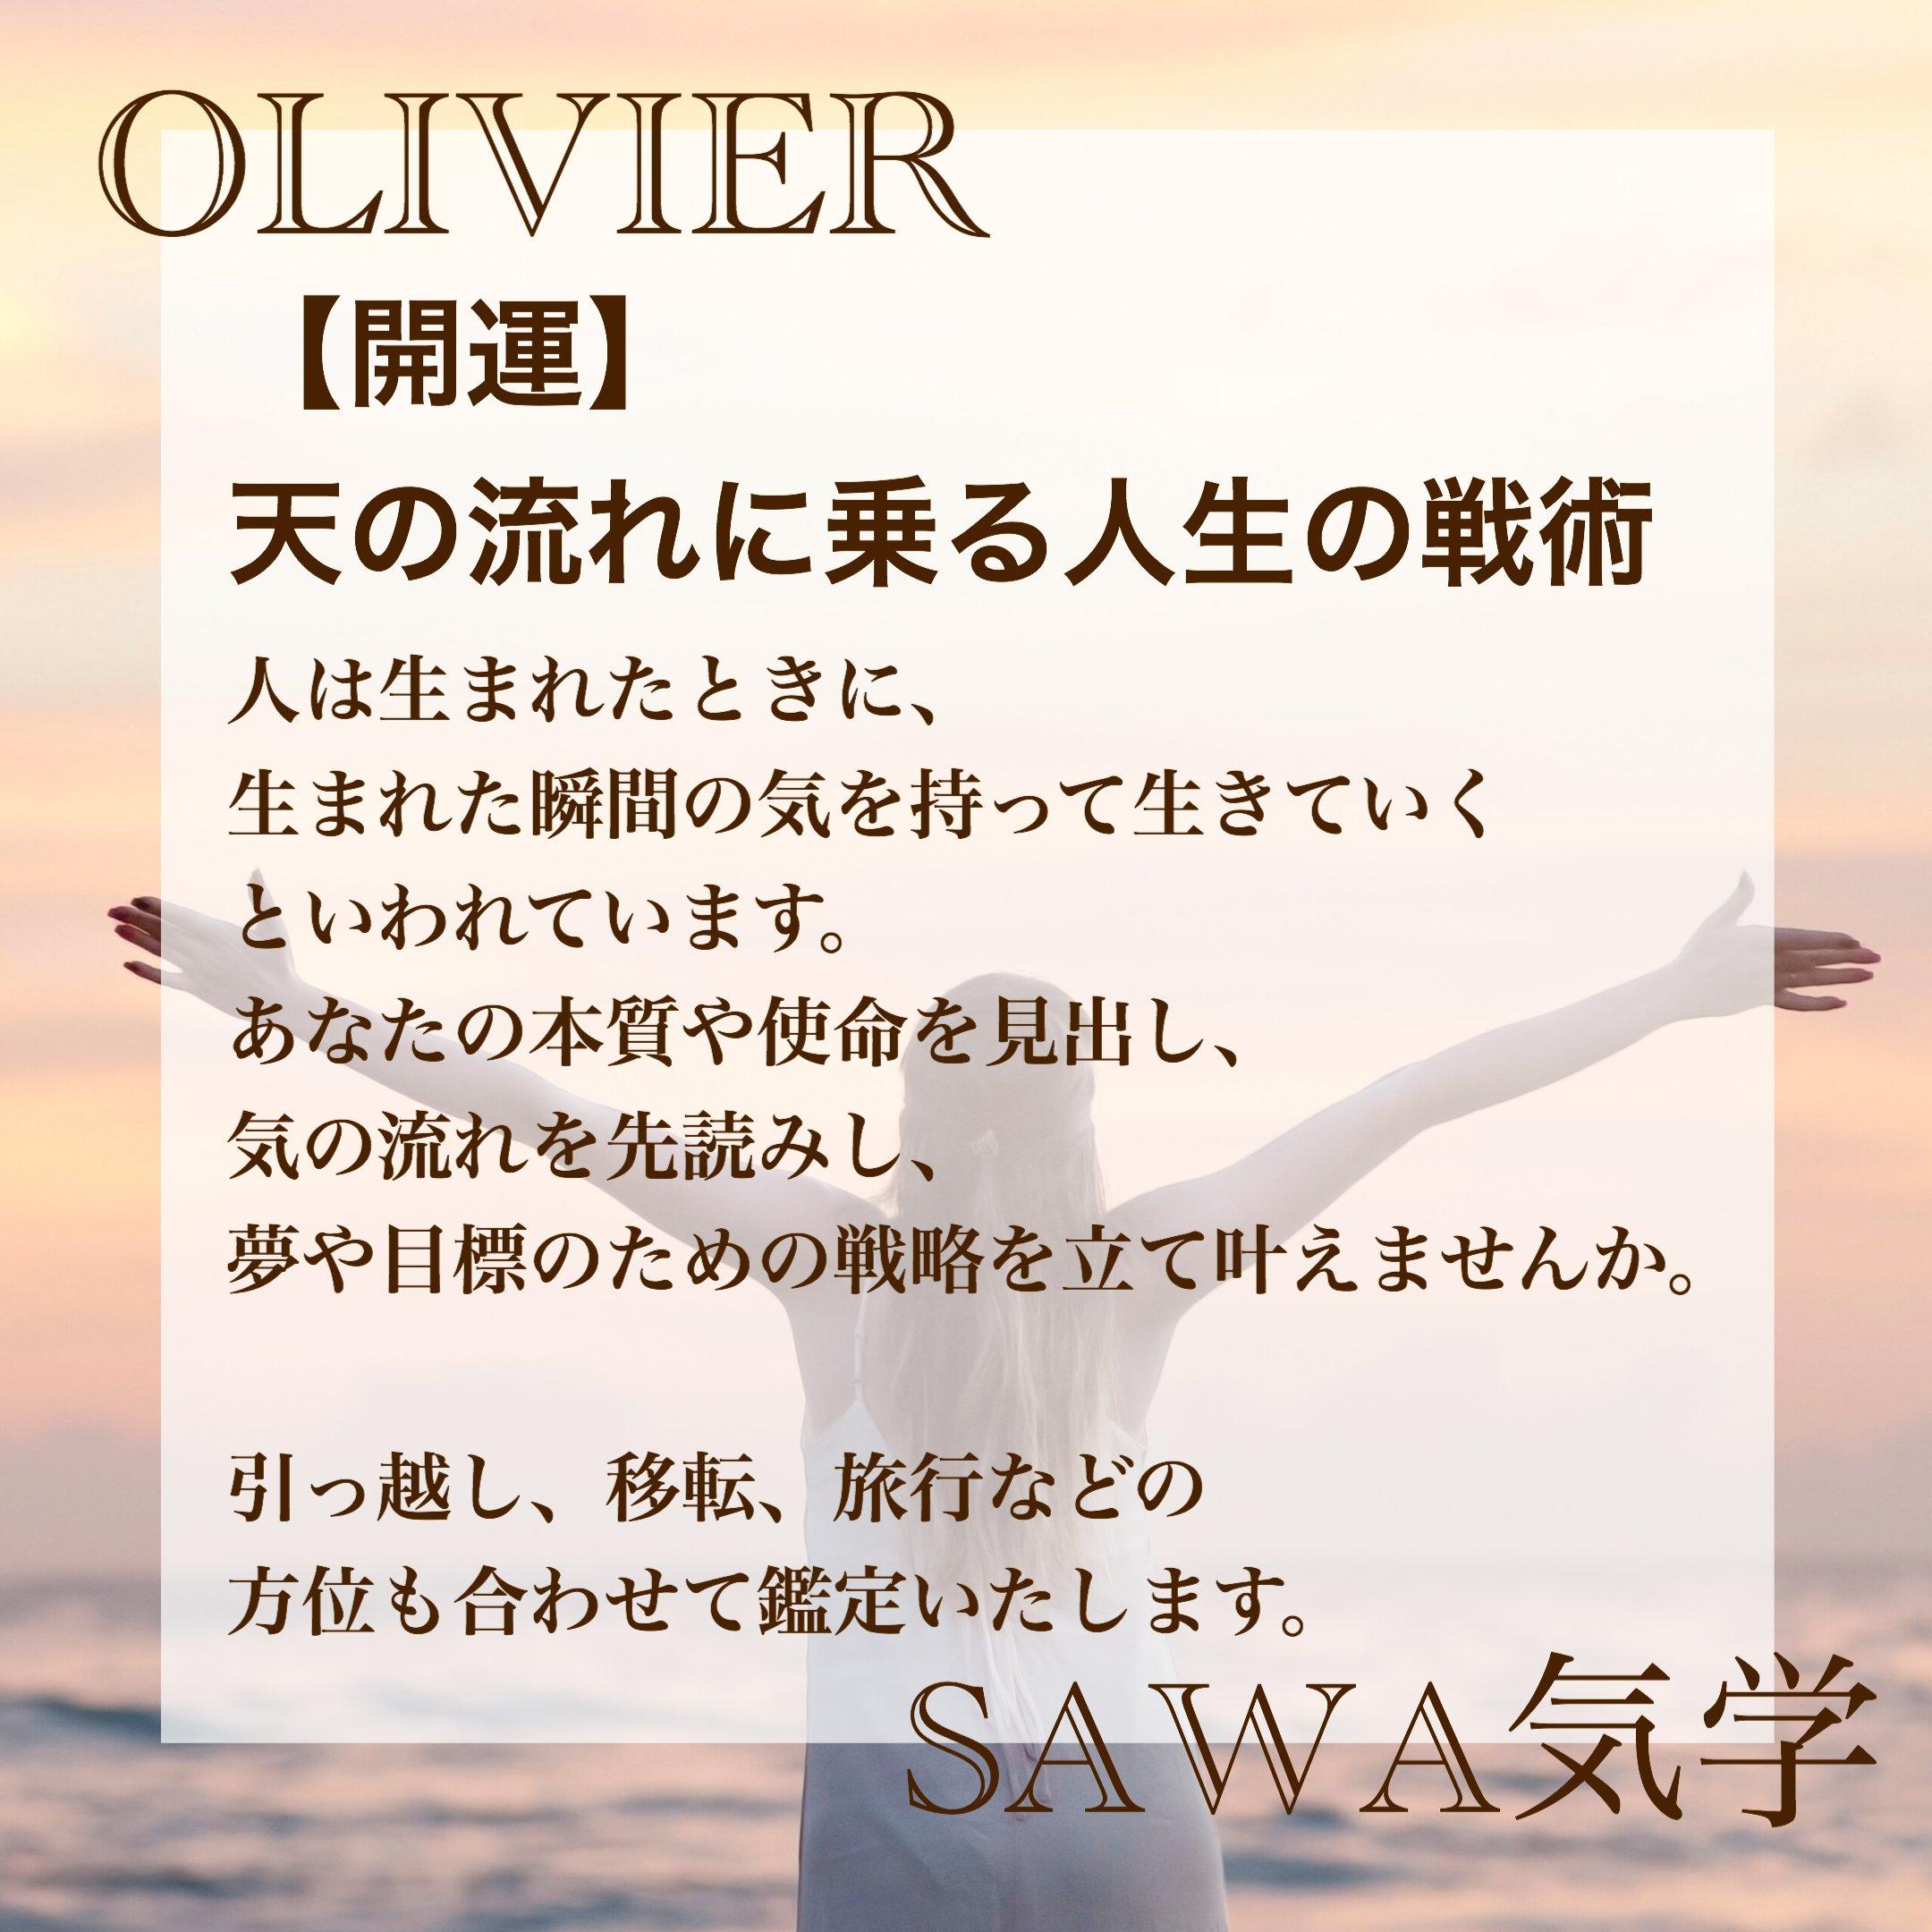 SAWA気学オンライン鑑定60分〜【開運】天の流れに乗る人生の戦術〜のイメージその2